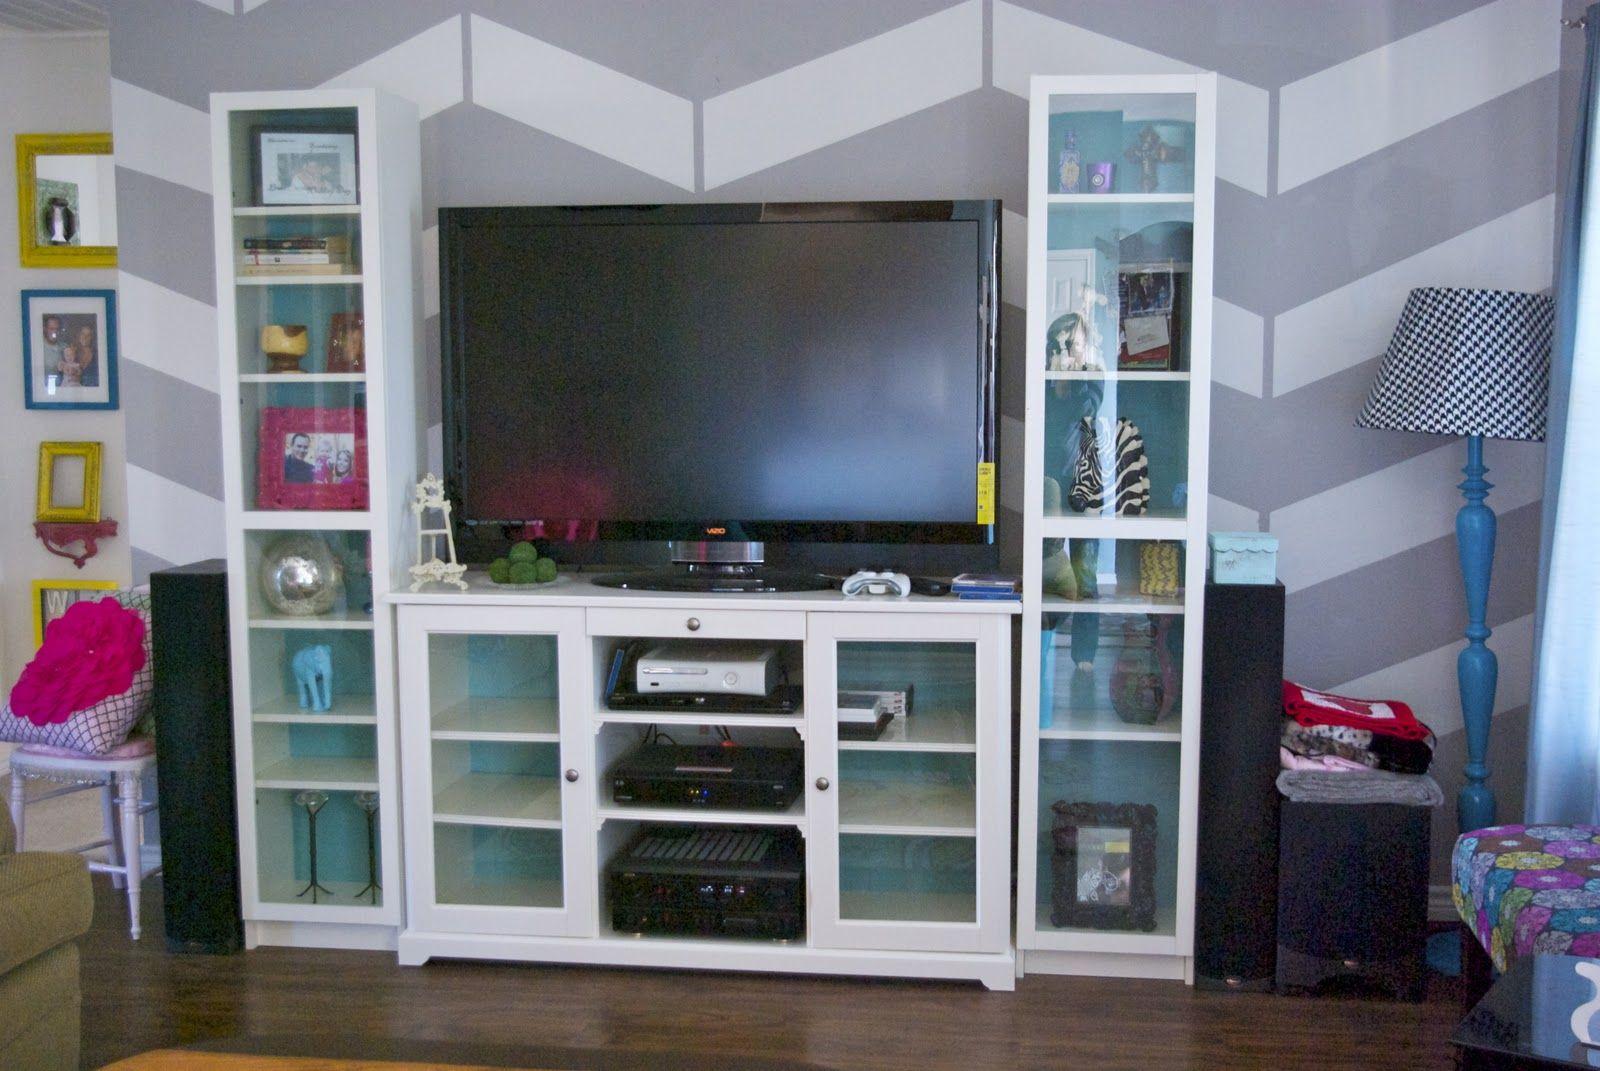 Liatorp Tv Kast.Liatorp Sideboard Width 145 Cm Depth 48 Cm Height 87 Cm